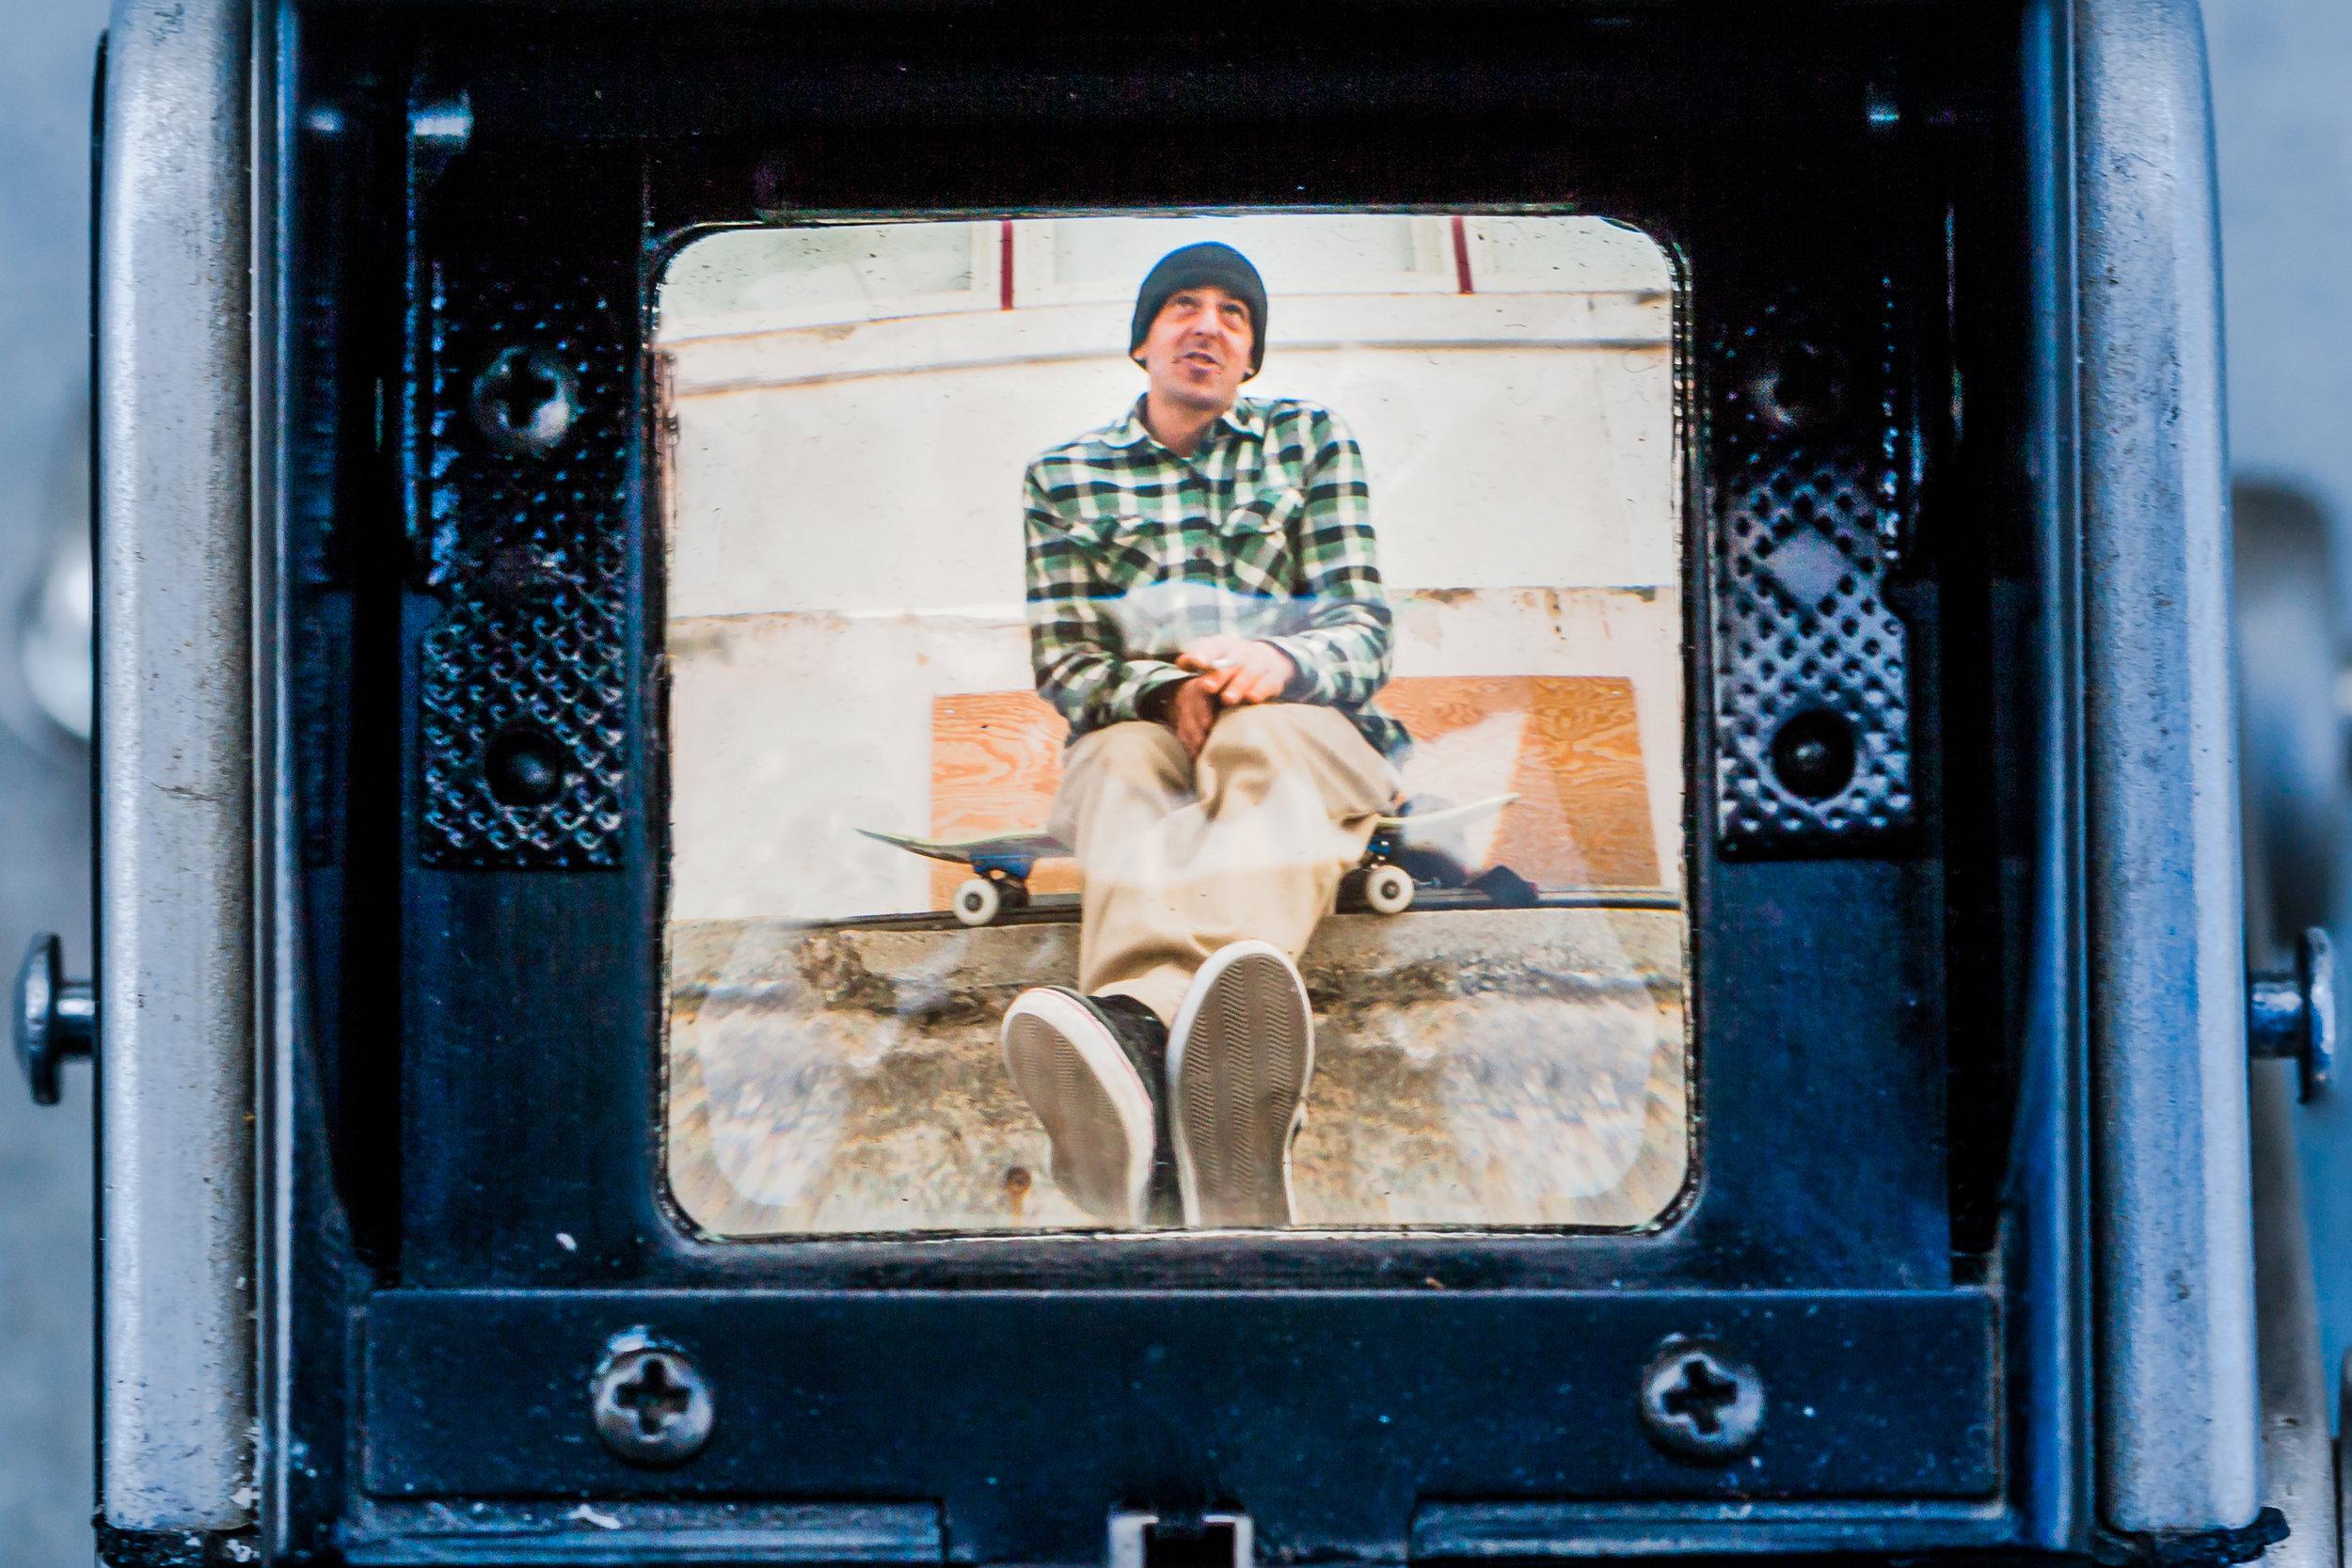 34-Frank_263R0049-Edit-Broach-Photo.jpg